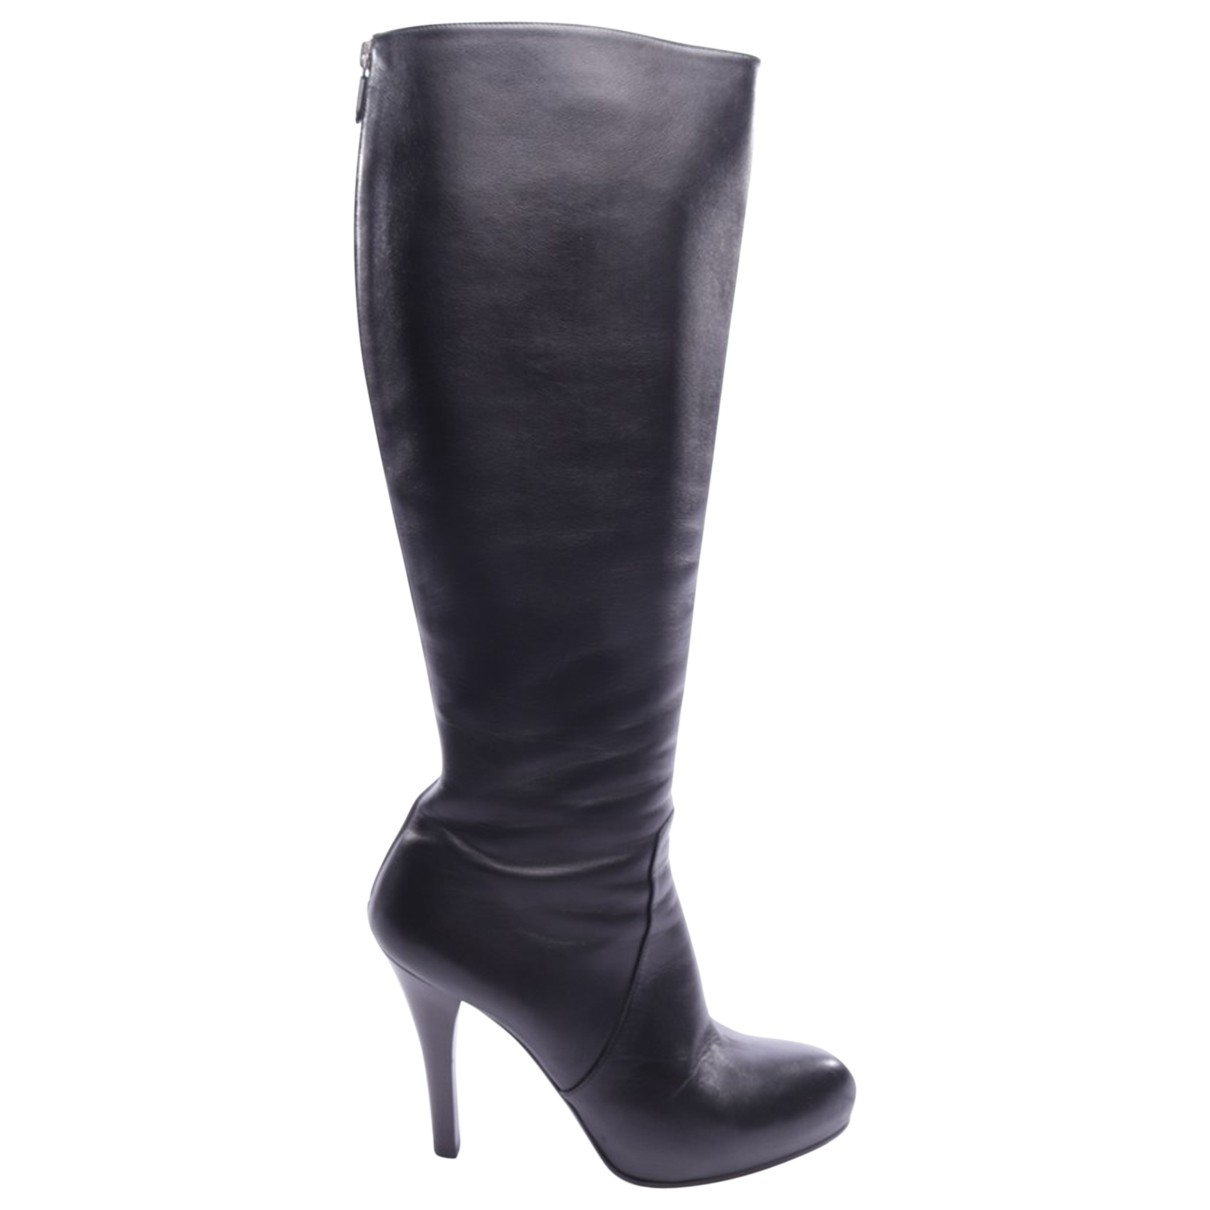 Bottega Veneta \N Black Leather Boots for Women 40 EU